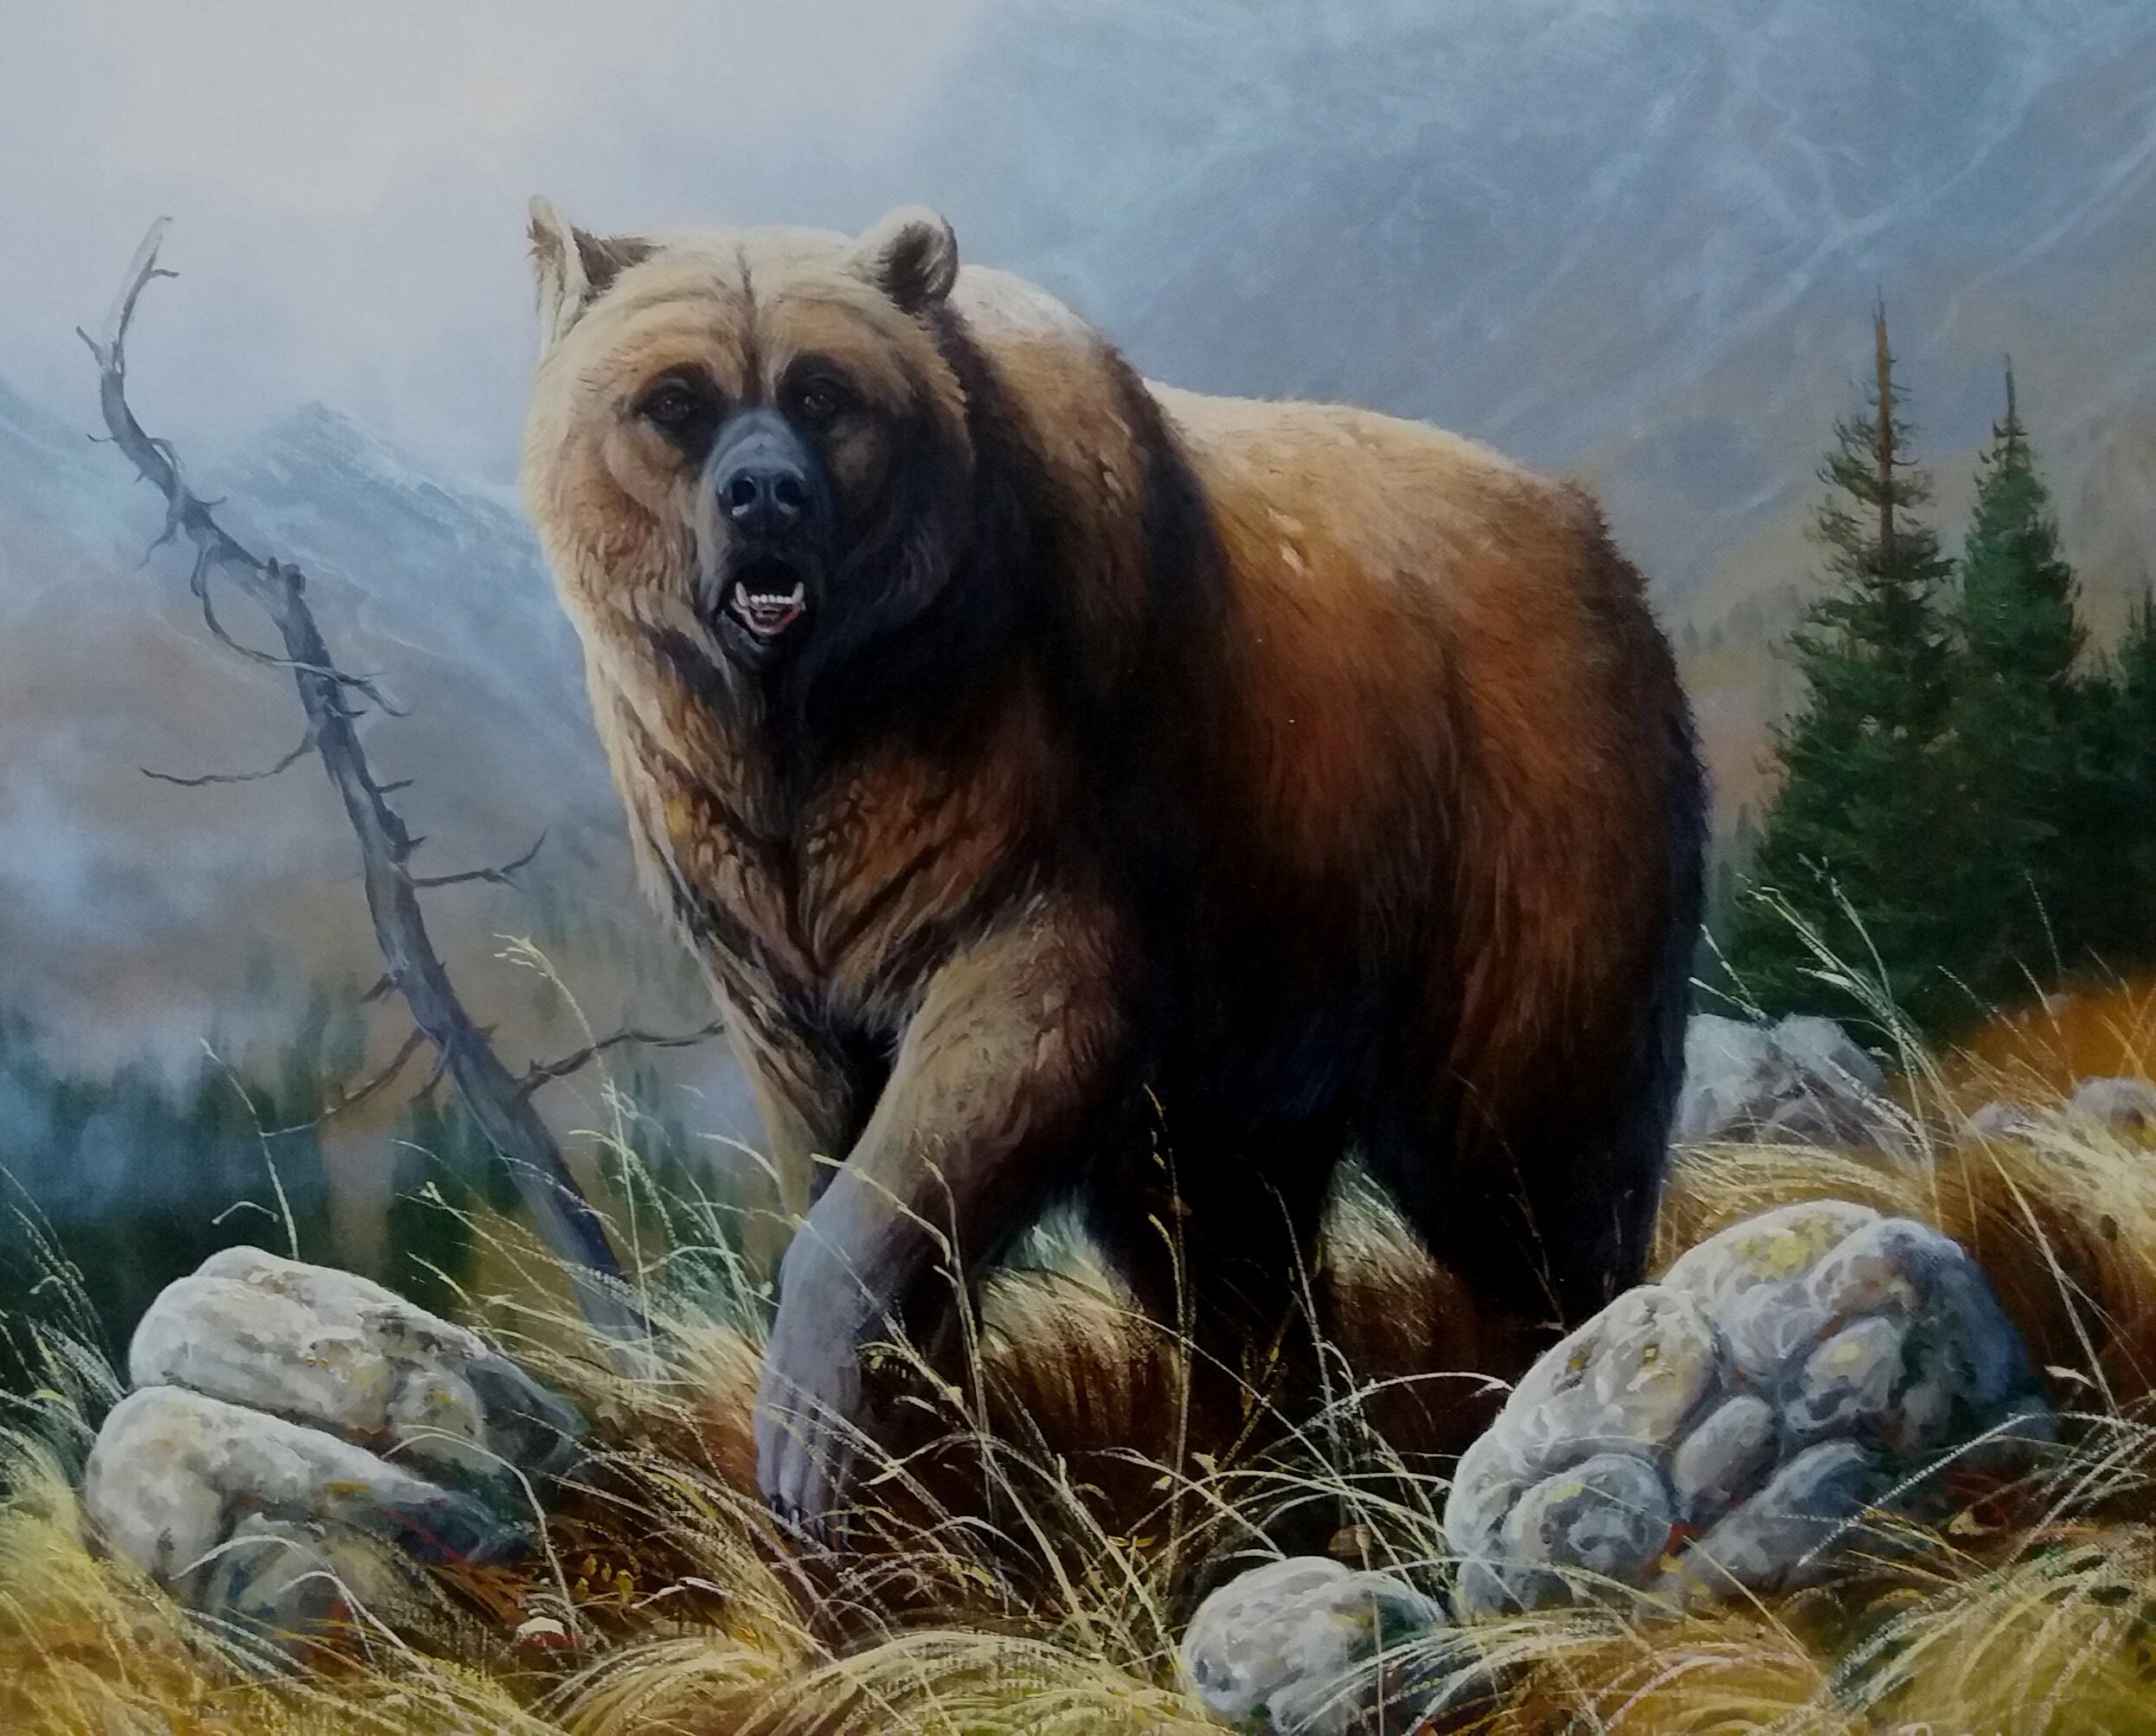 orso bruno roberto bianchi davide celli simbiosi magazine